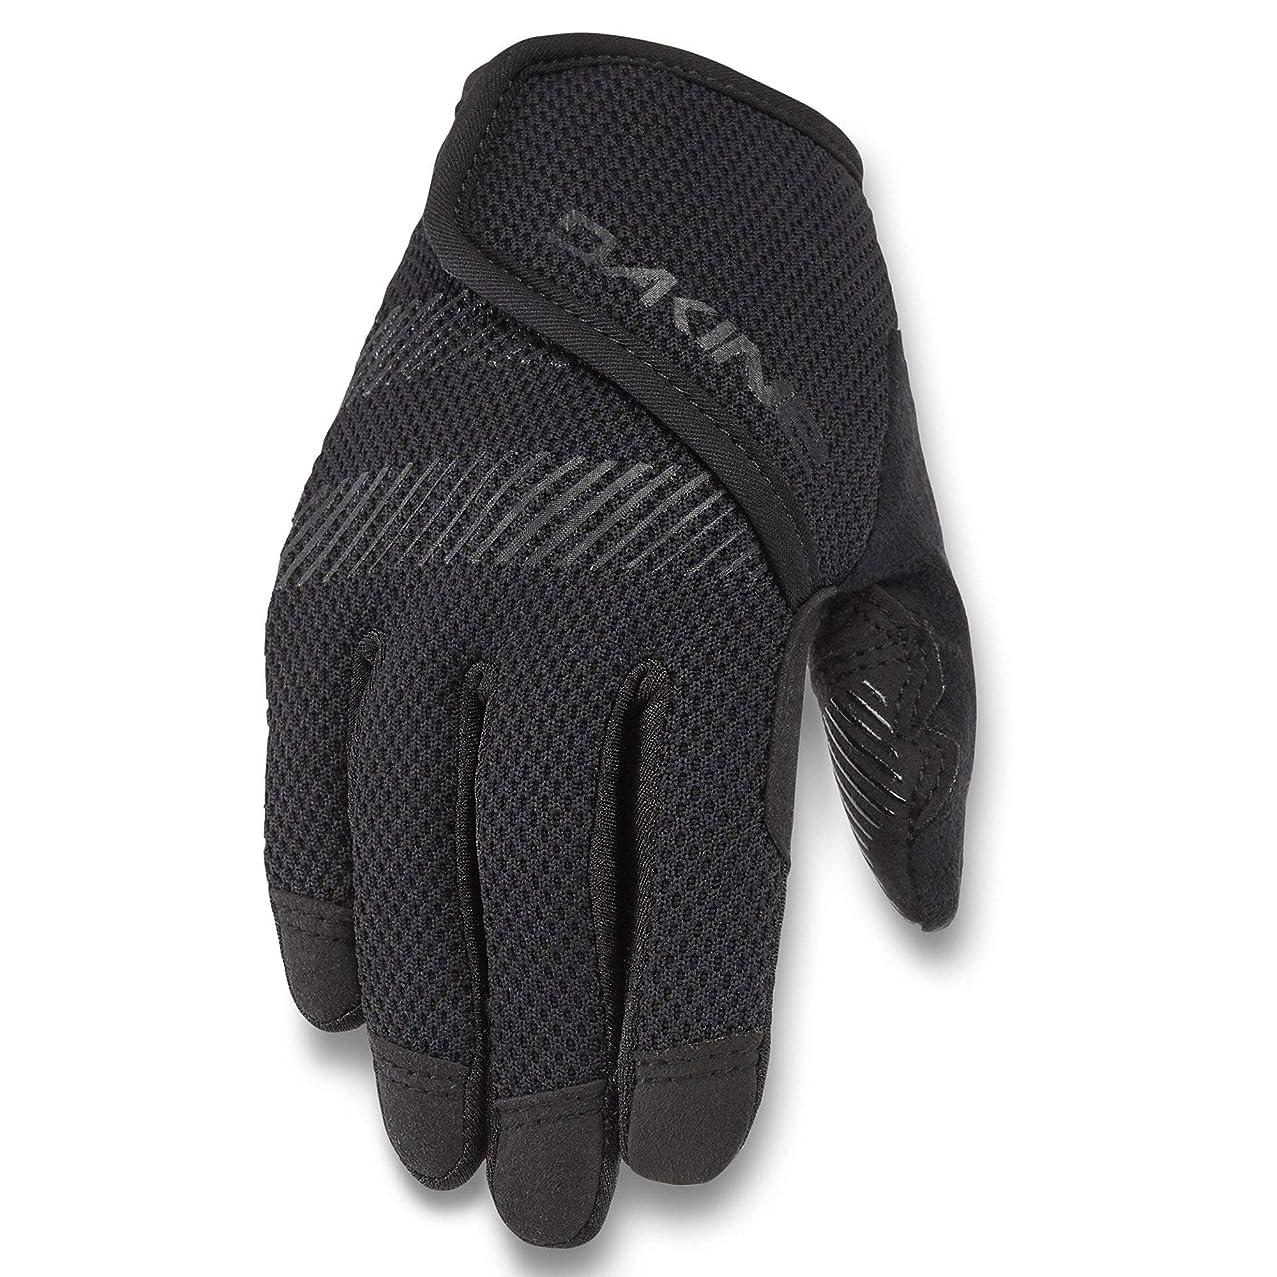 Dakine False Prodigy Full-Finger Bike Glove